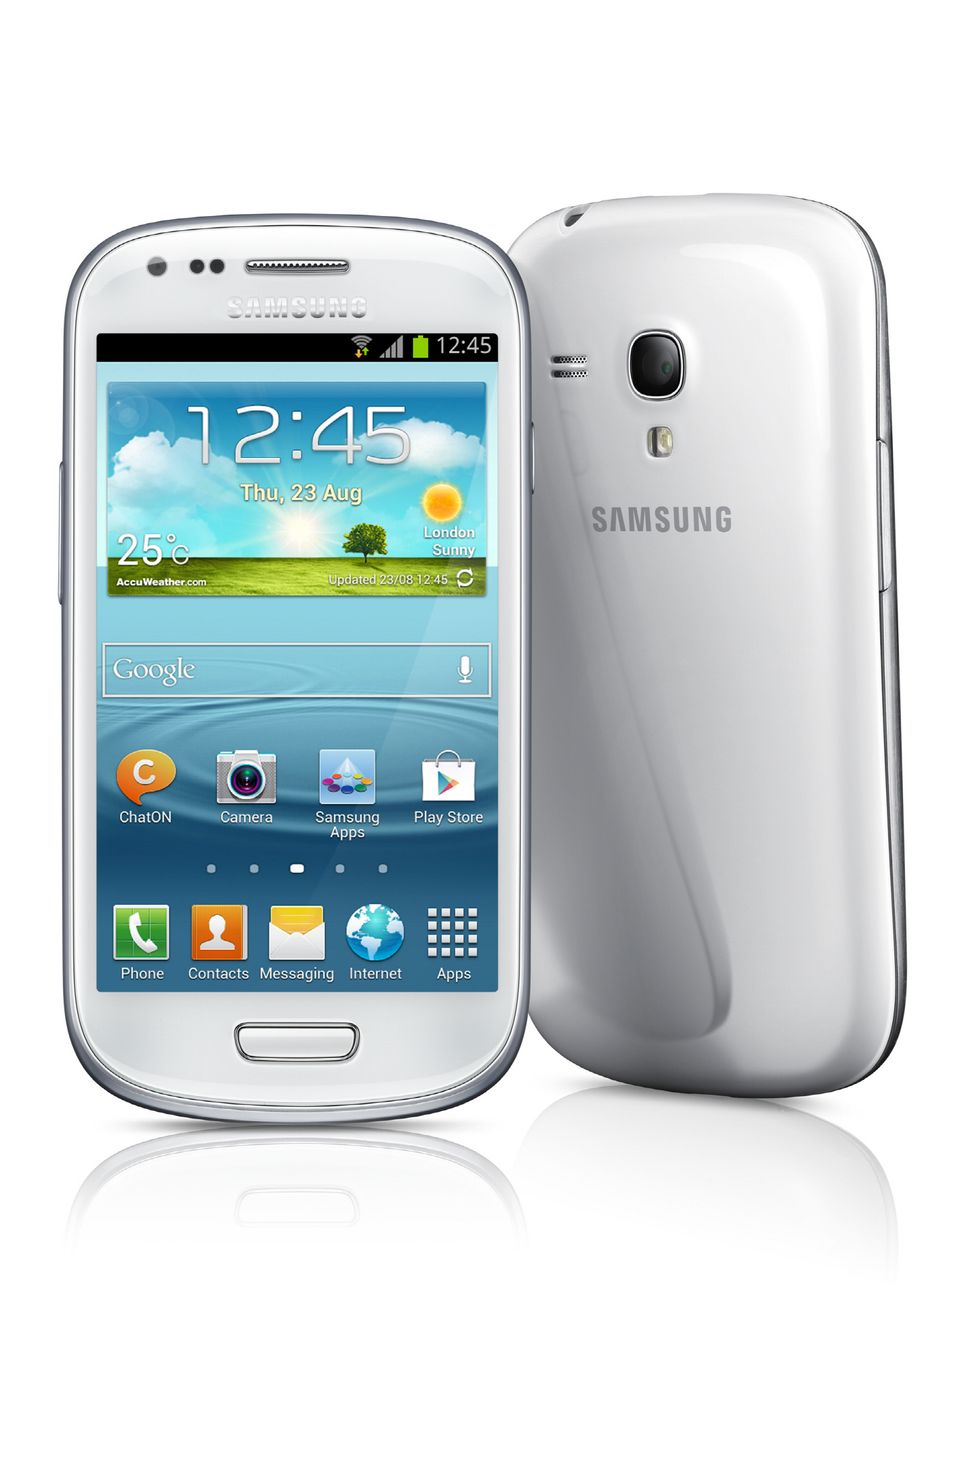 Top 5 smartphone: comanda Samsung, ma la sorpresa è ZTE